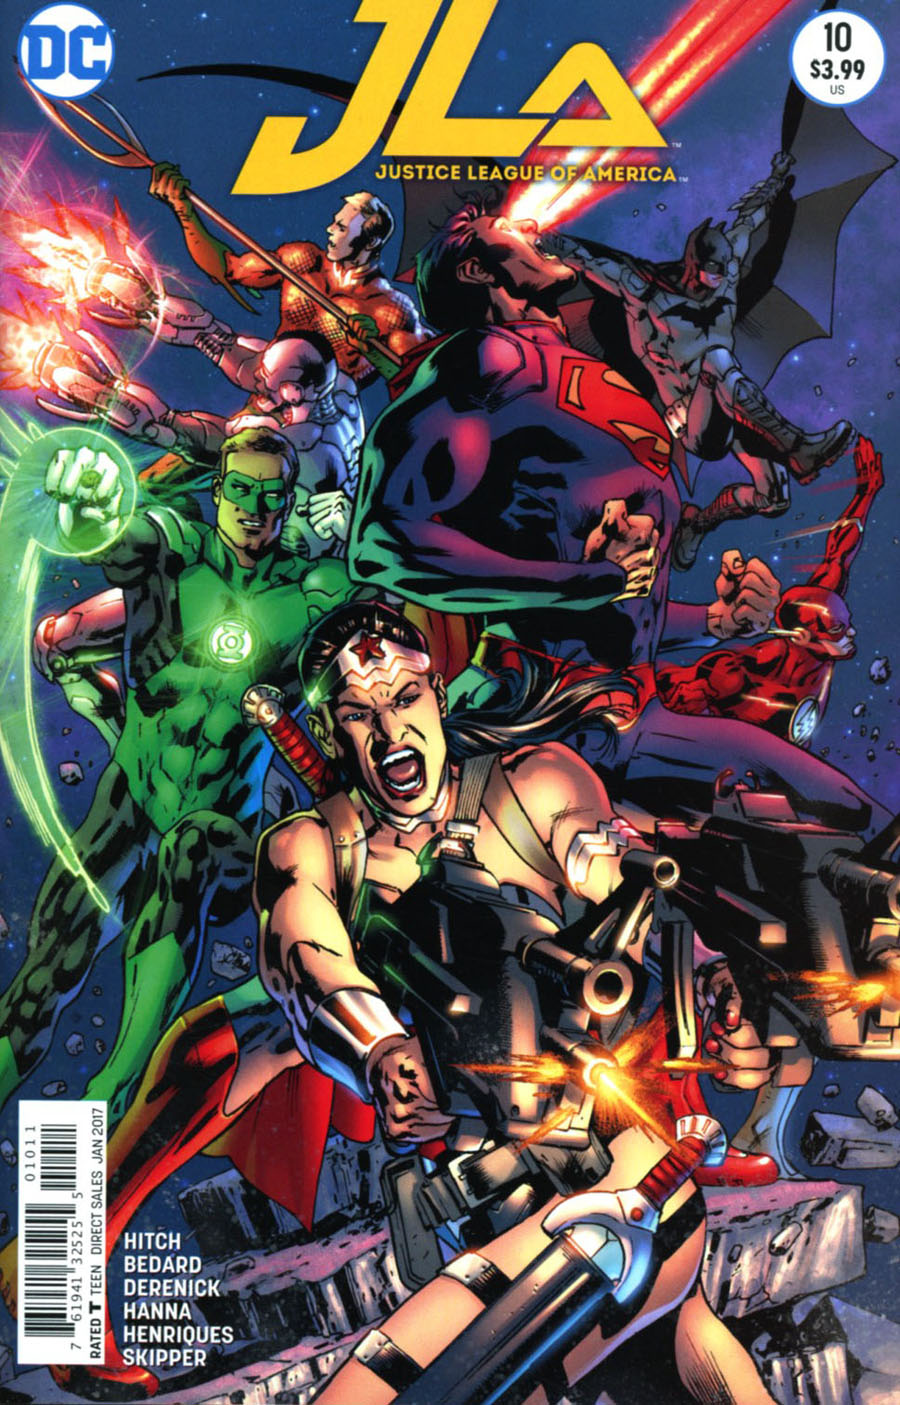 Justice League Of America Vol 4 #10 Cover A Regular Bryan Hitch Cover